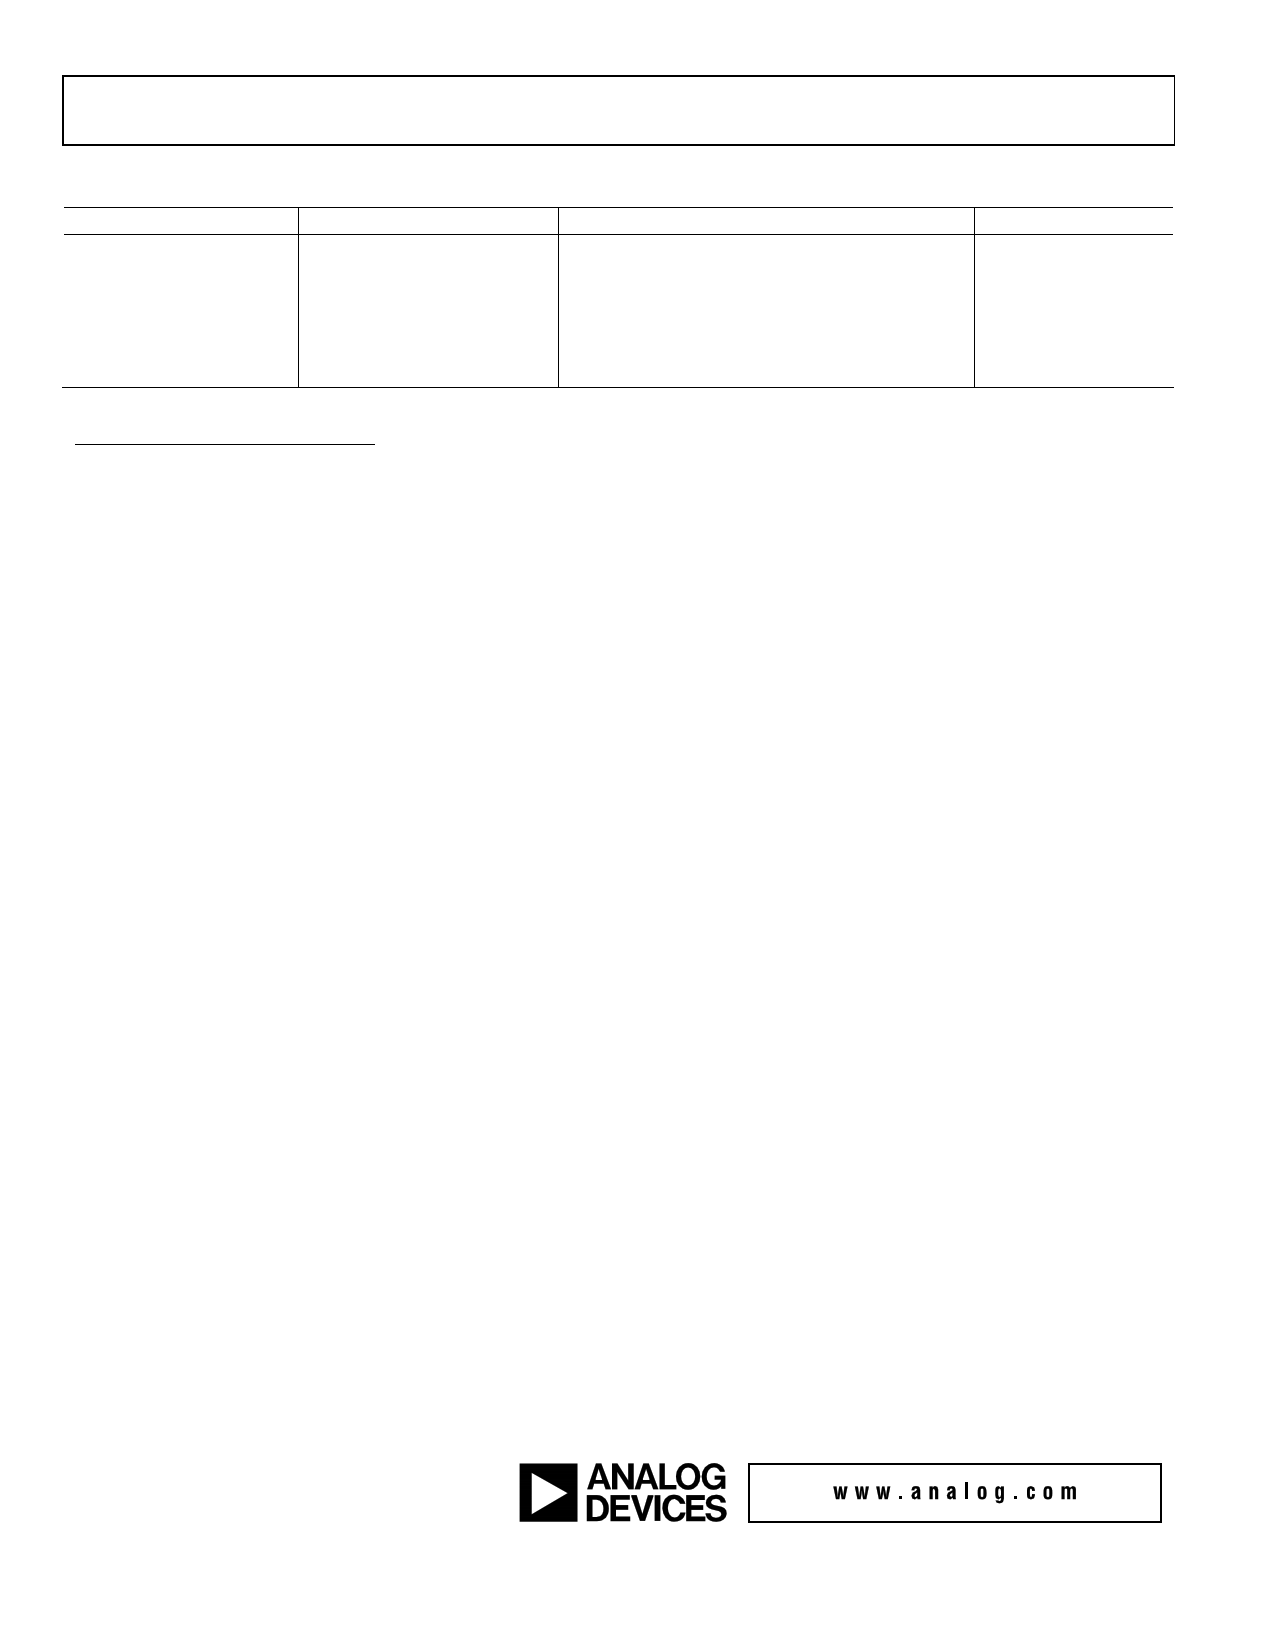 ad7265 datasheet ( differential input/ dual 1 msps/ 12-bit/ 3